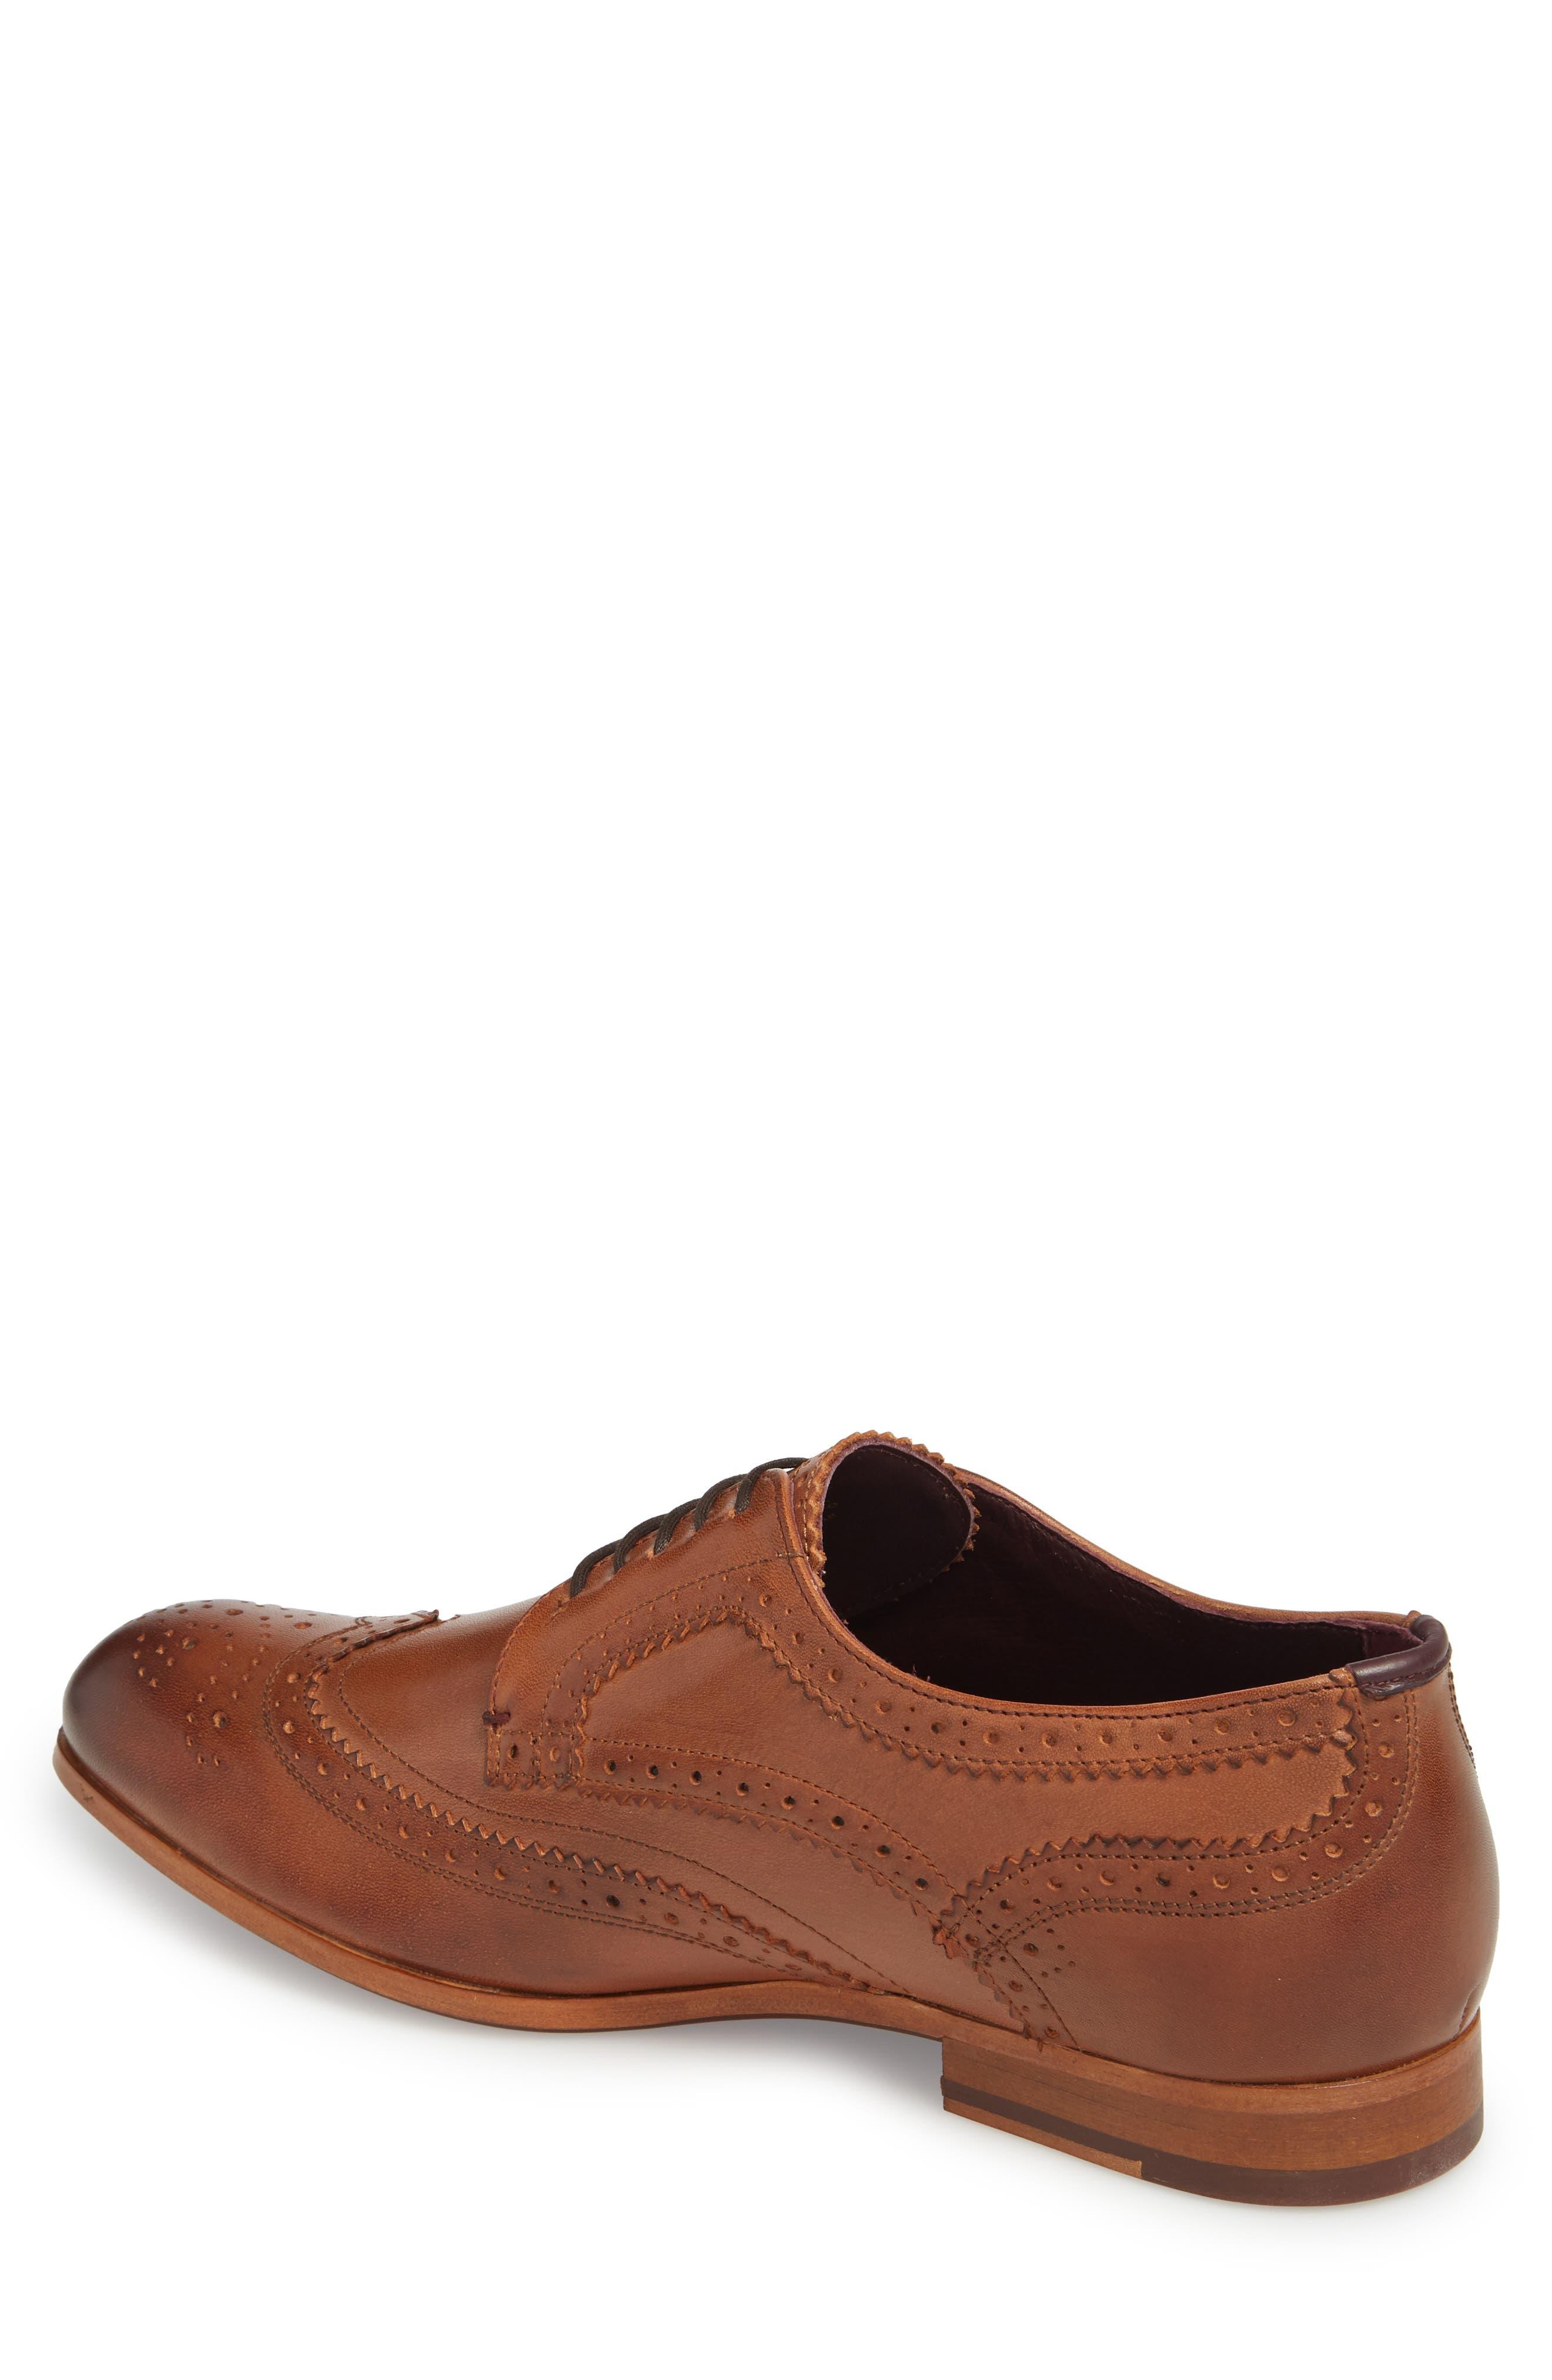 Camyli Wingtip,                             Alternate thumbnail 2, color,                             Tan Leather